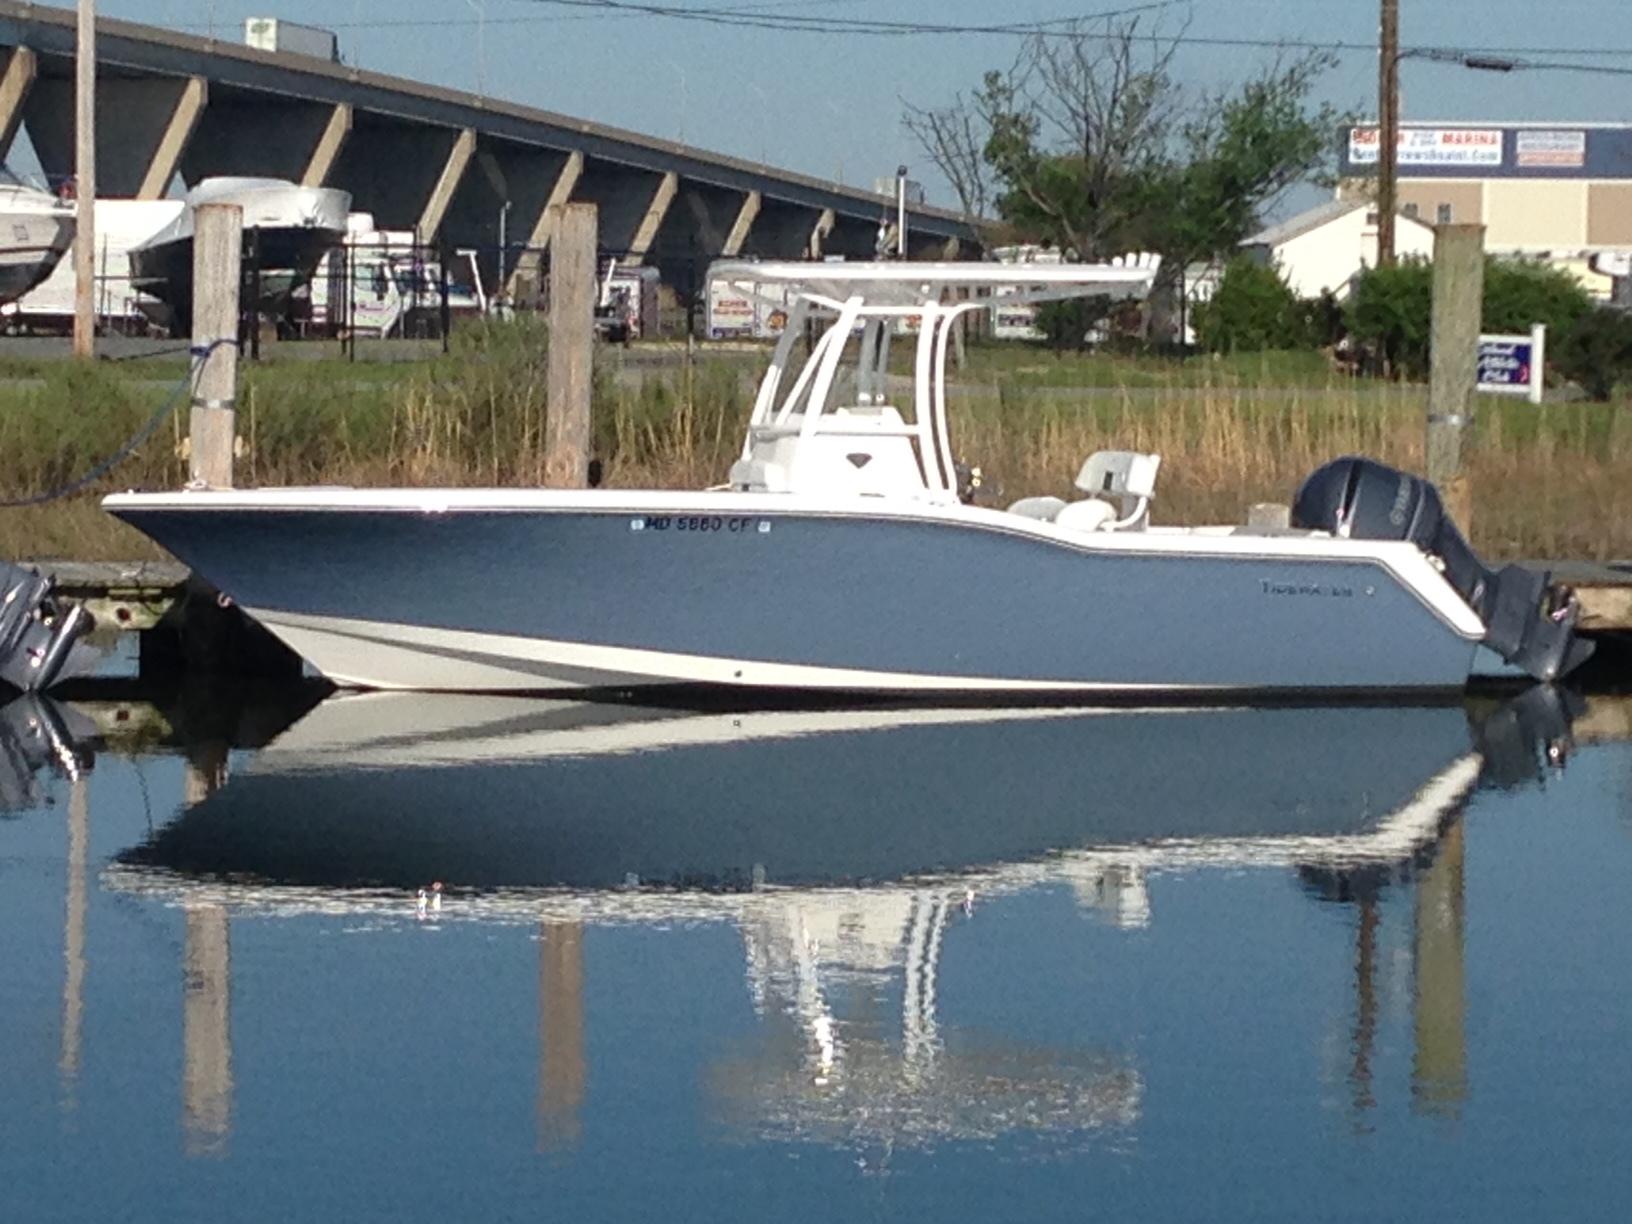 Tidewater 250